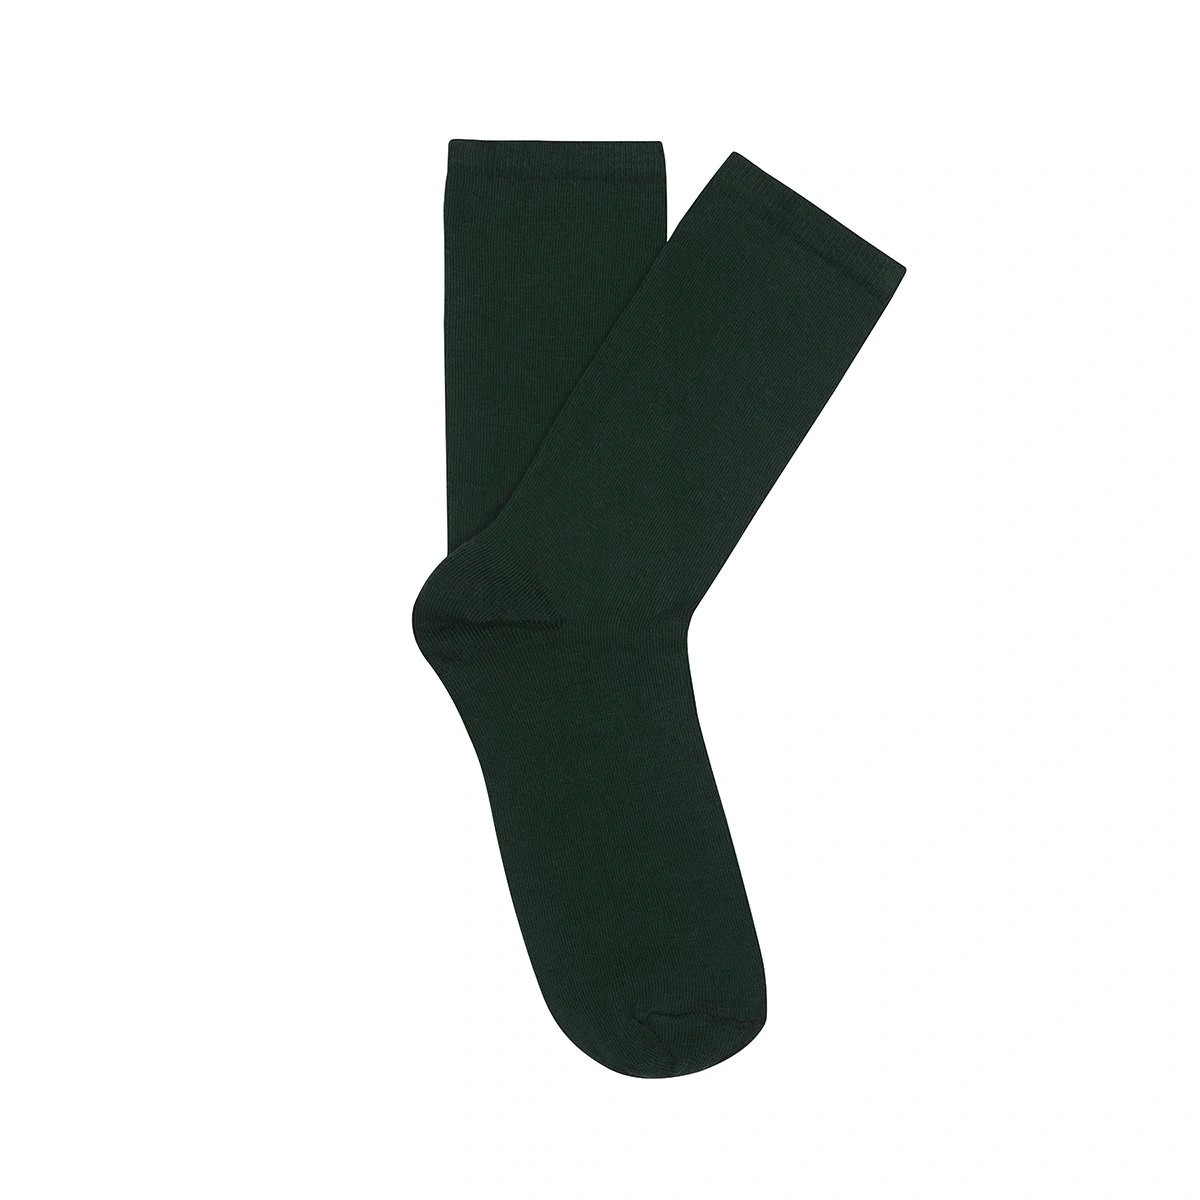 Kity Boof Çorap Dark Green